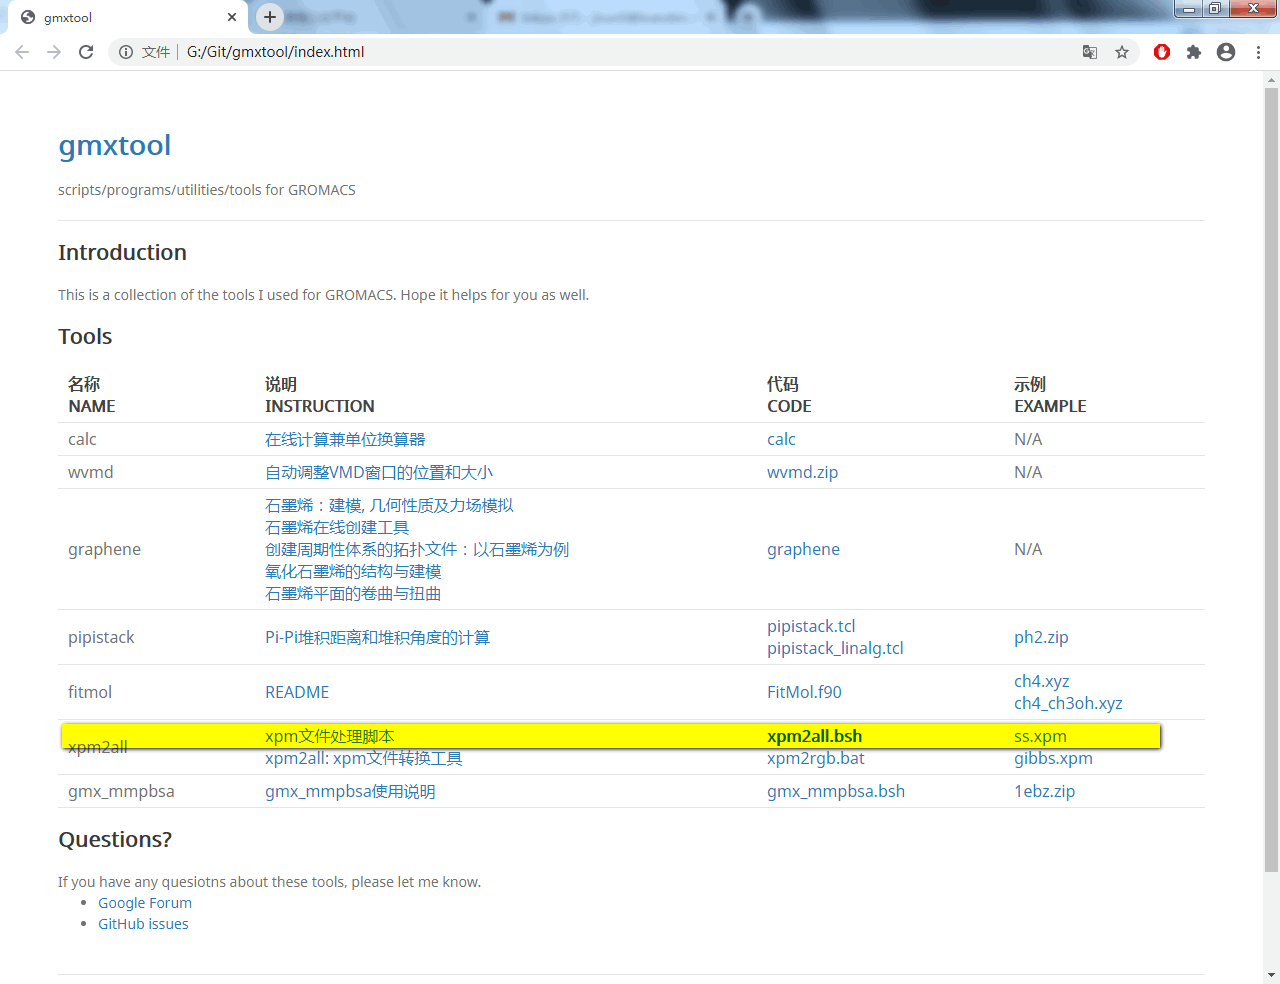 "下载最新脚本<a href=""https://jerkwin.github.io/gmxtool/"">xpm2all.bsh</a>, 测试文件<a href=""https://jerkwin.github.io/gmxtool/"">ss.xpm</a>"